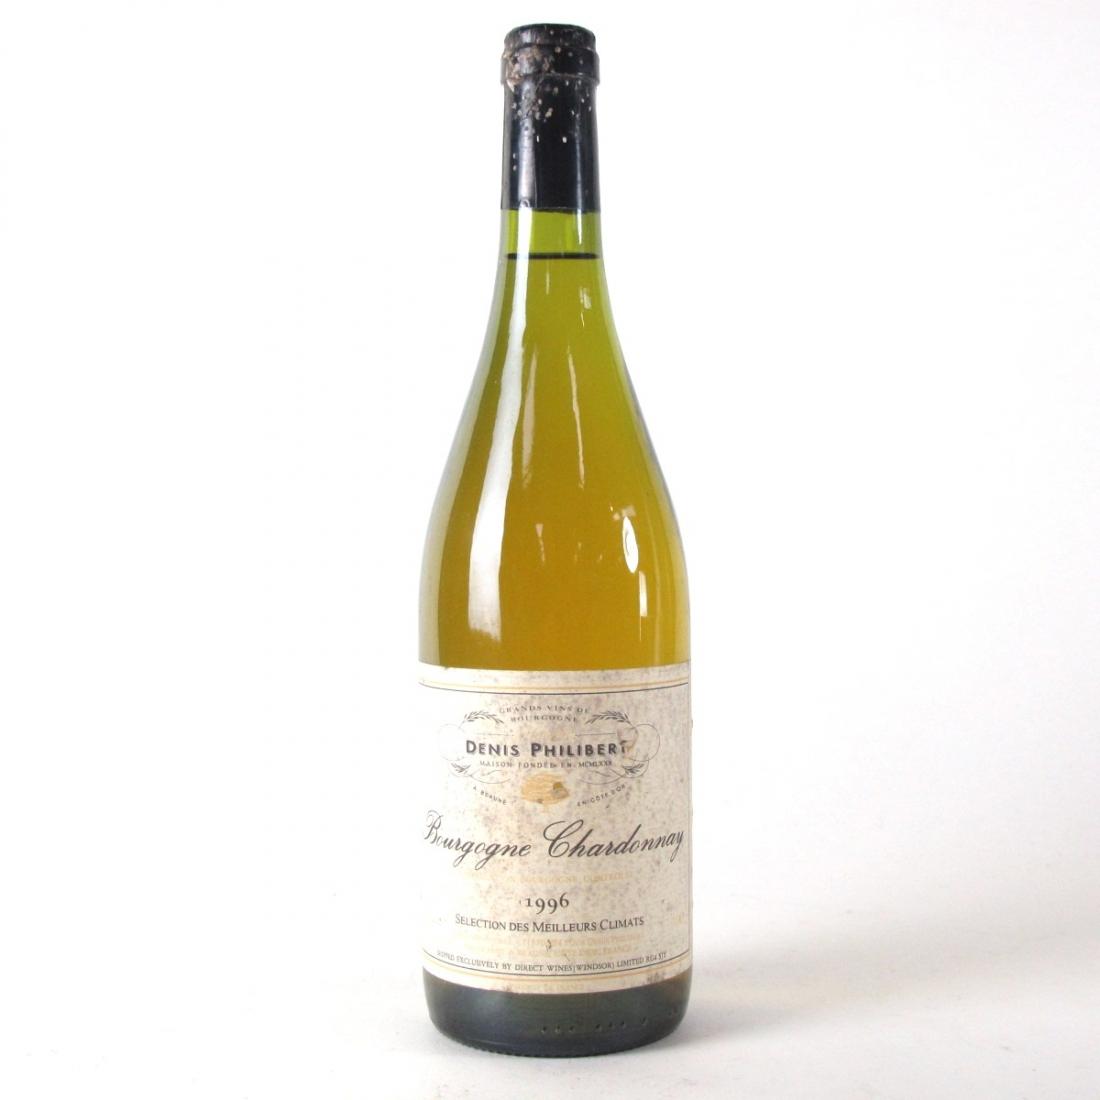 D.Philibert Chardonnay 1996 Bourgogne